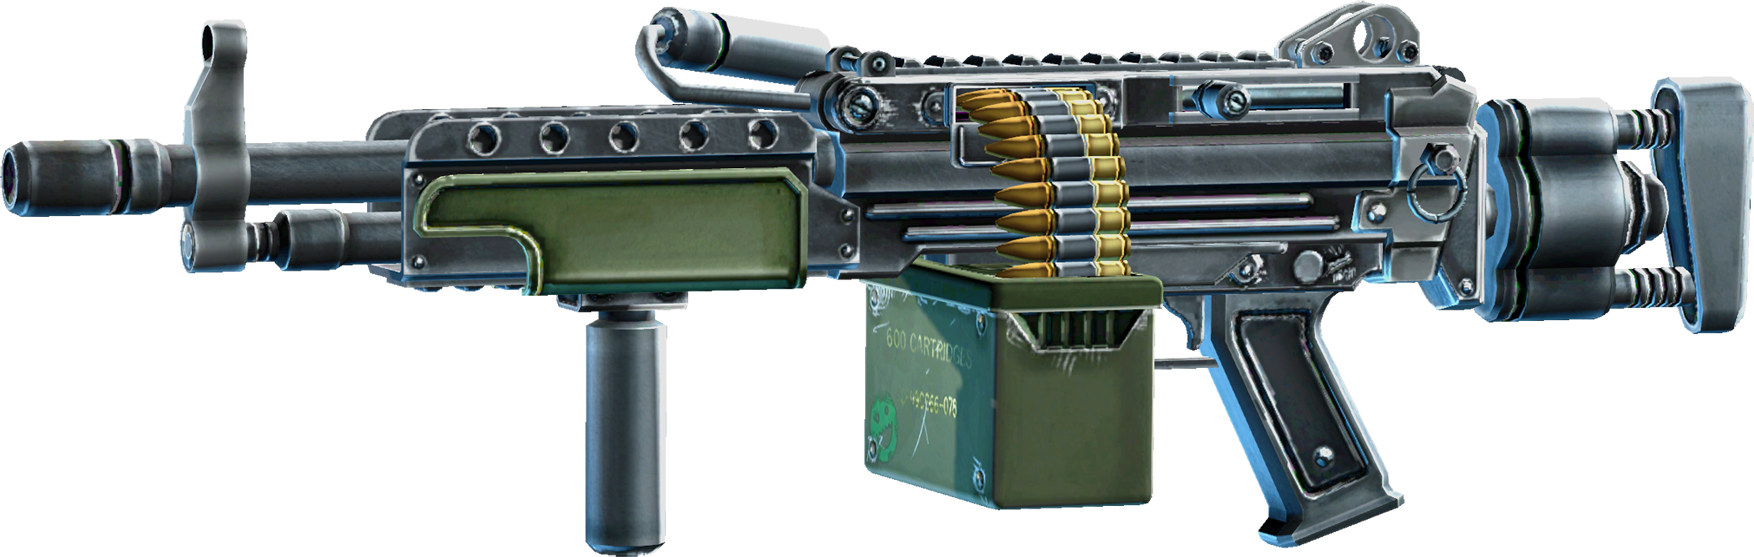 Big Guns PNG - 158425